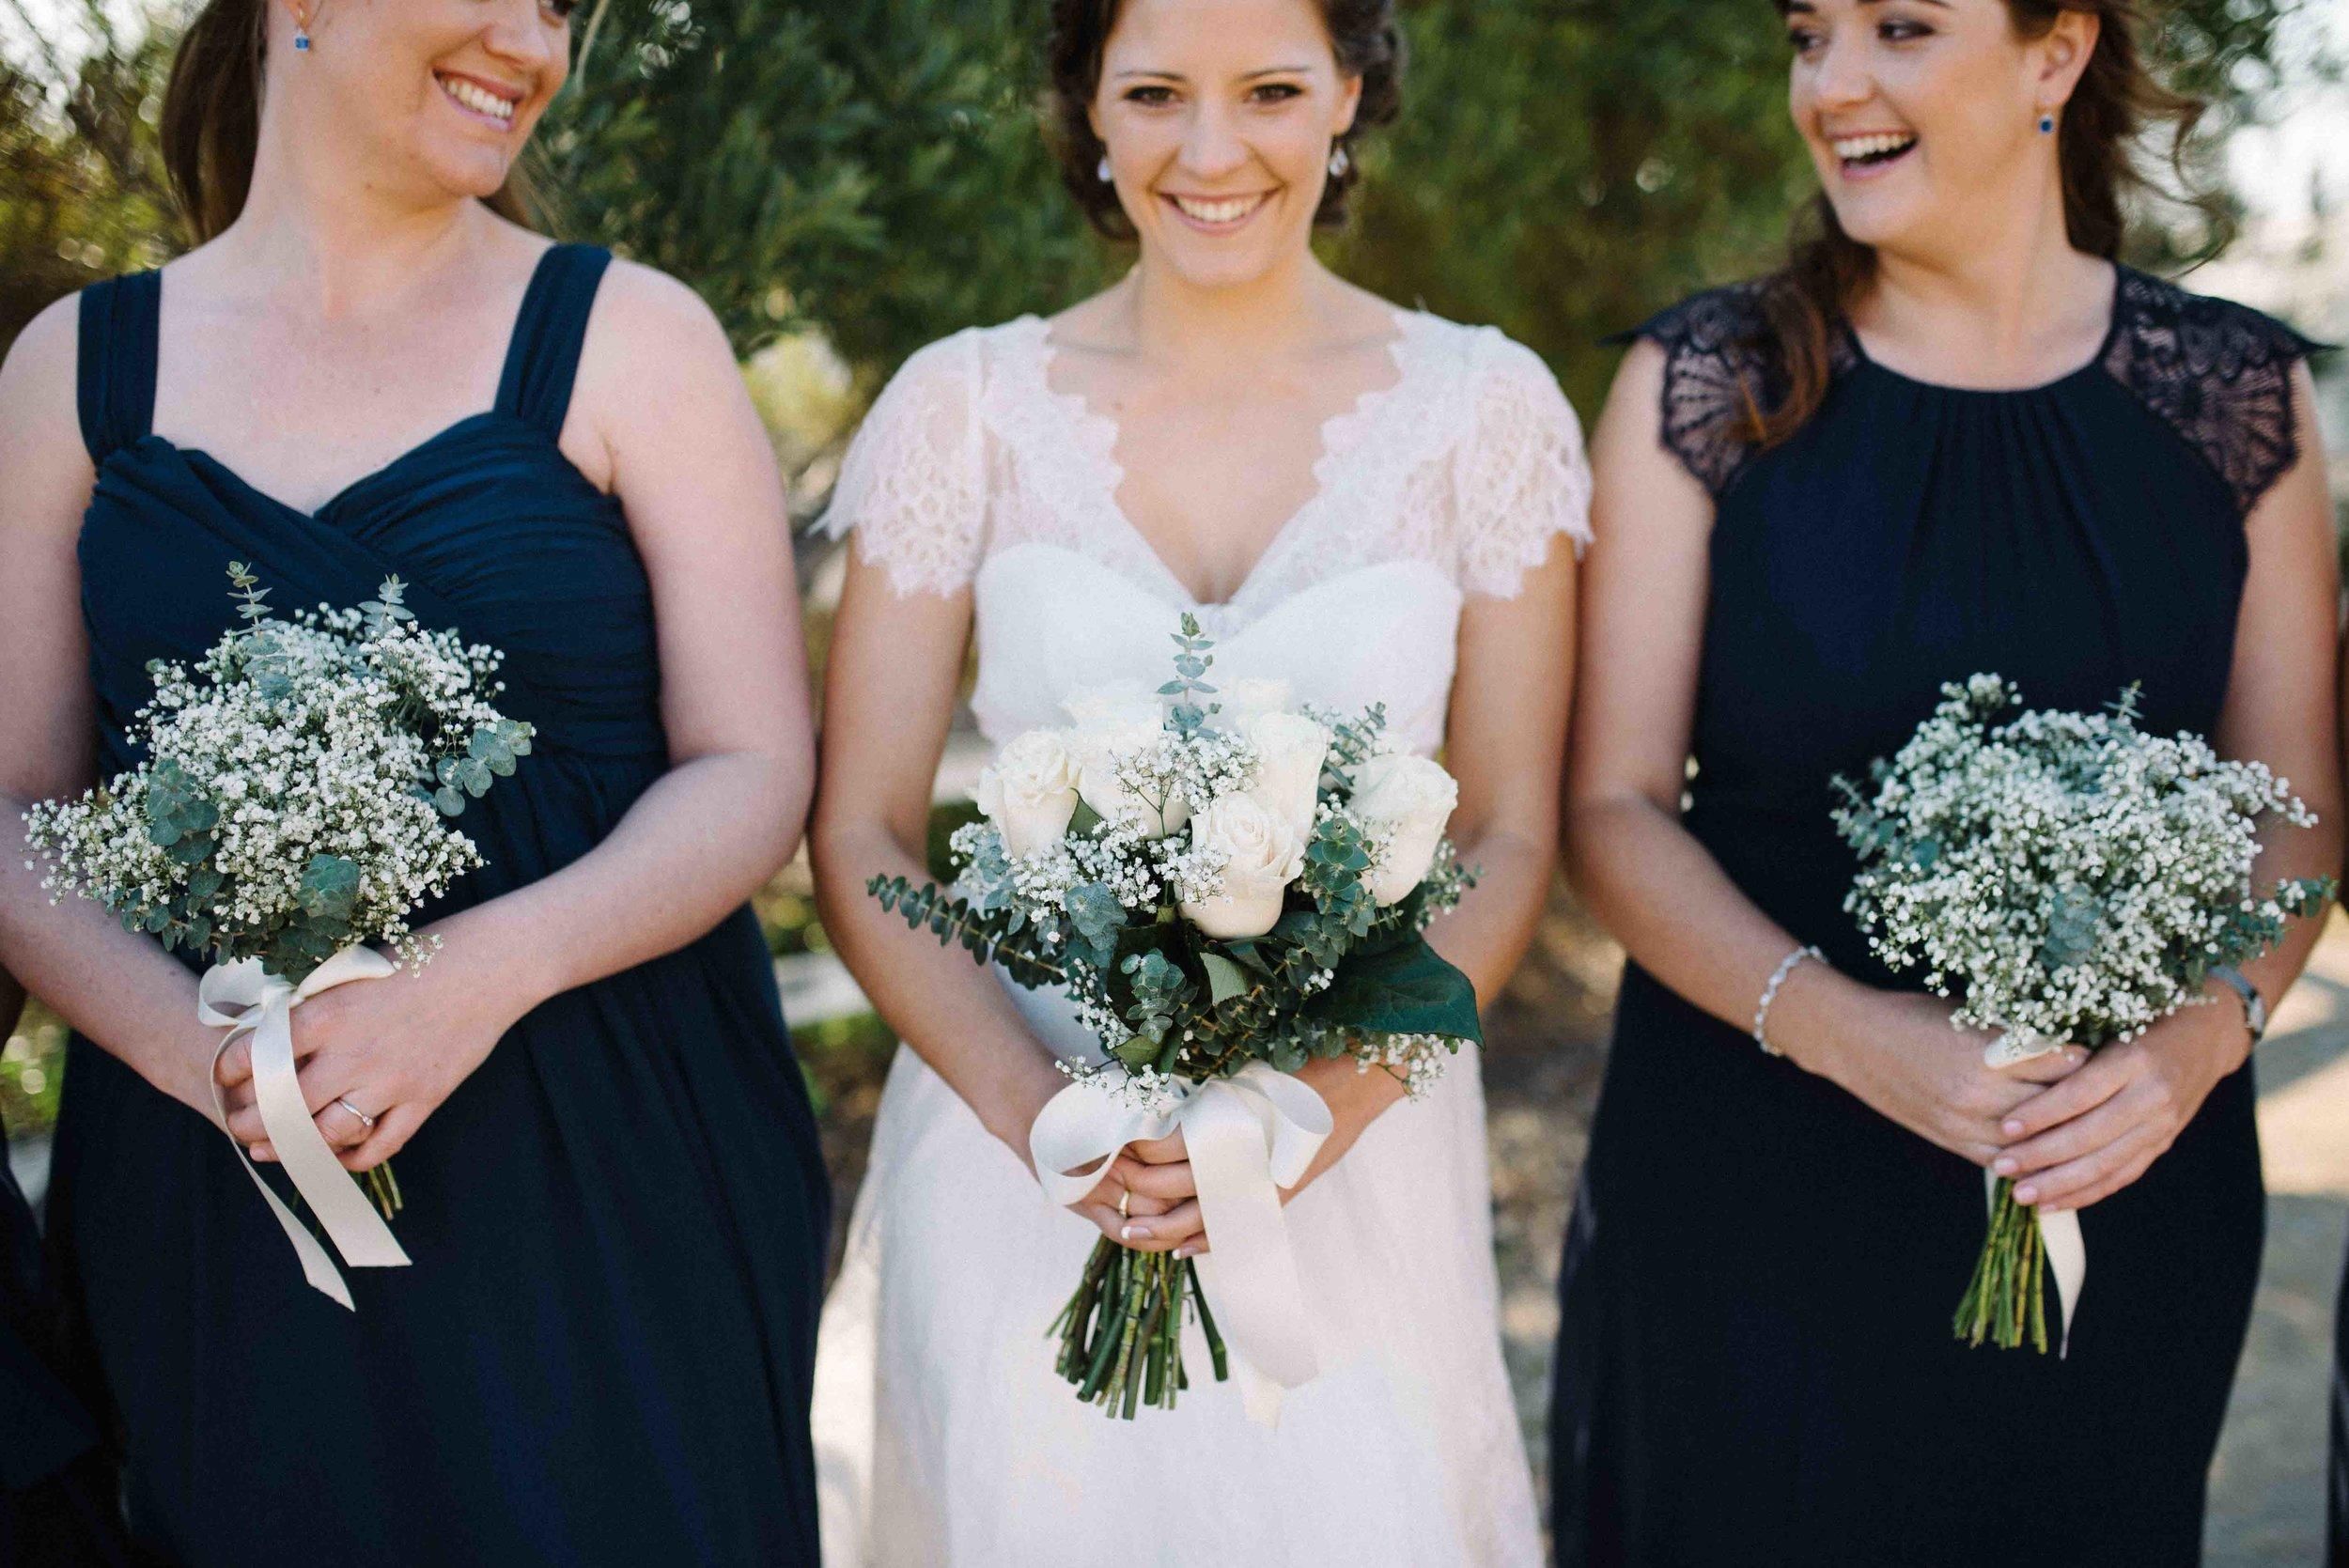 47-anastasia bridal perth wedding.jpg